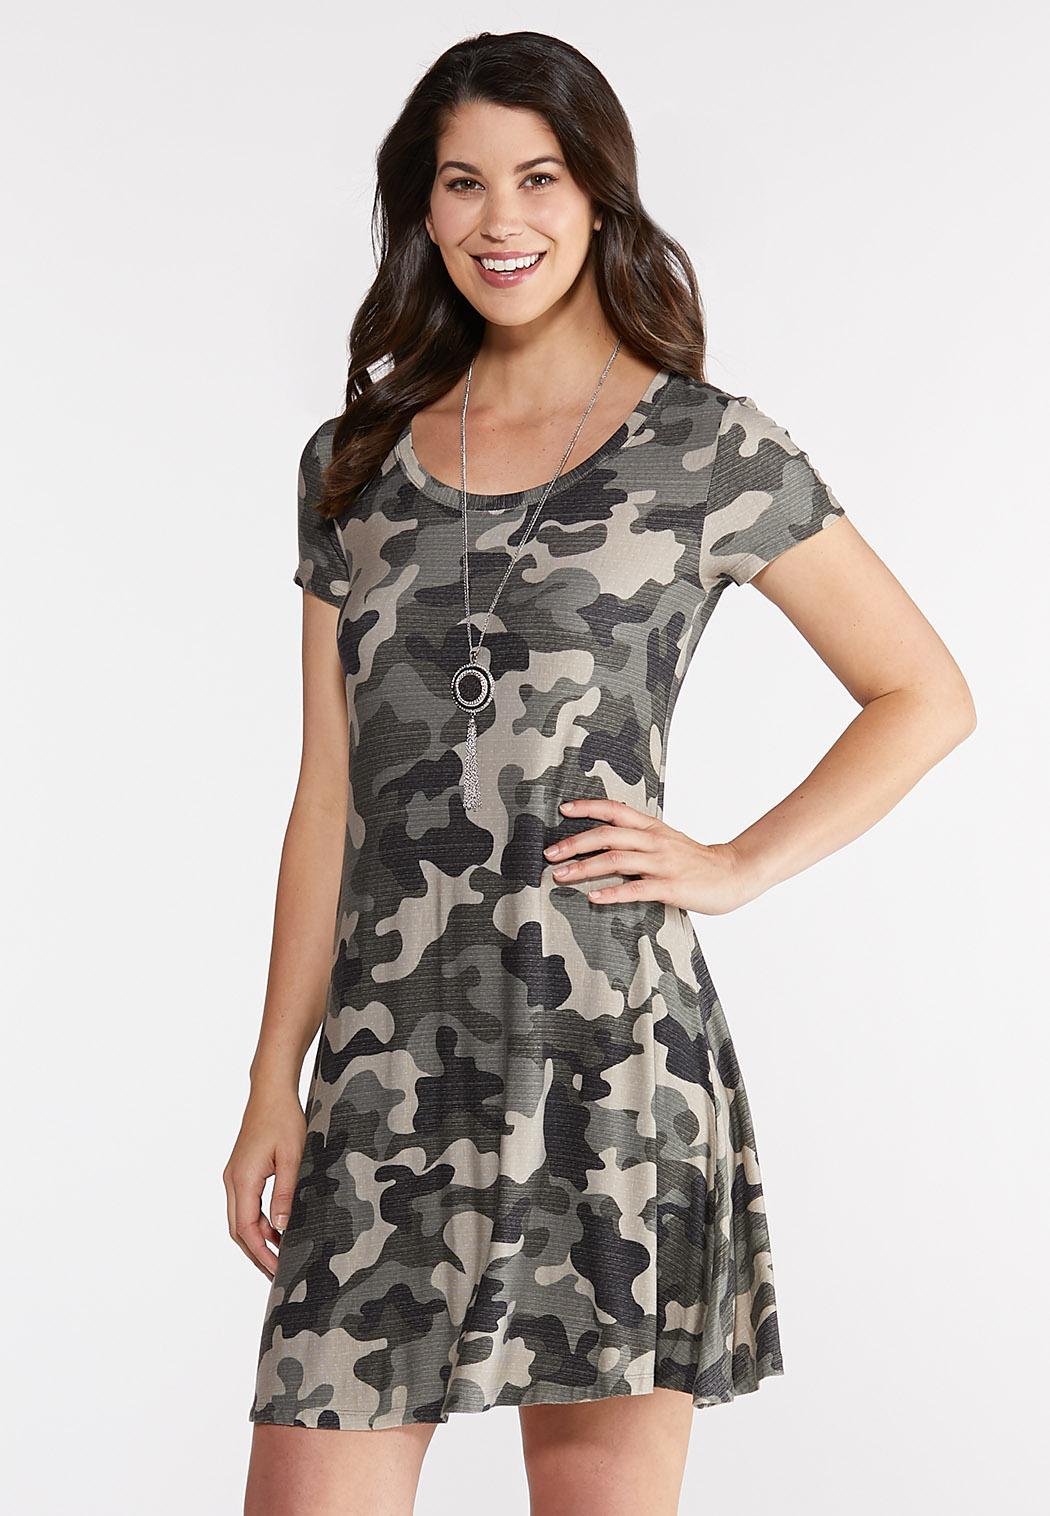 85bbb3cb13468 Plus Size Camo Swing Dress A-line & Swing Cato Fashions